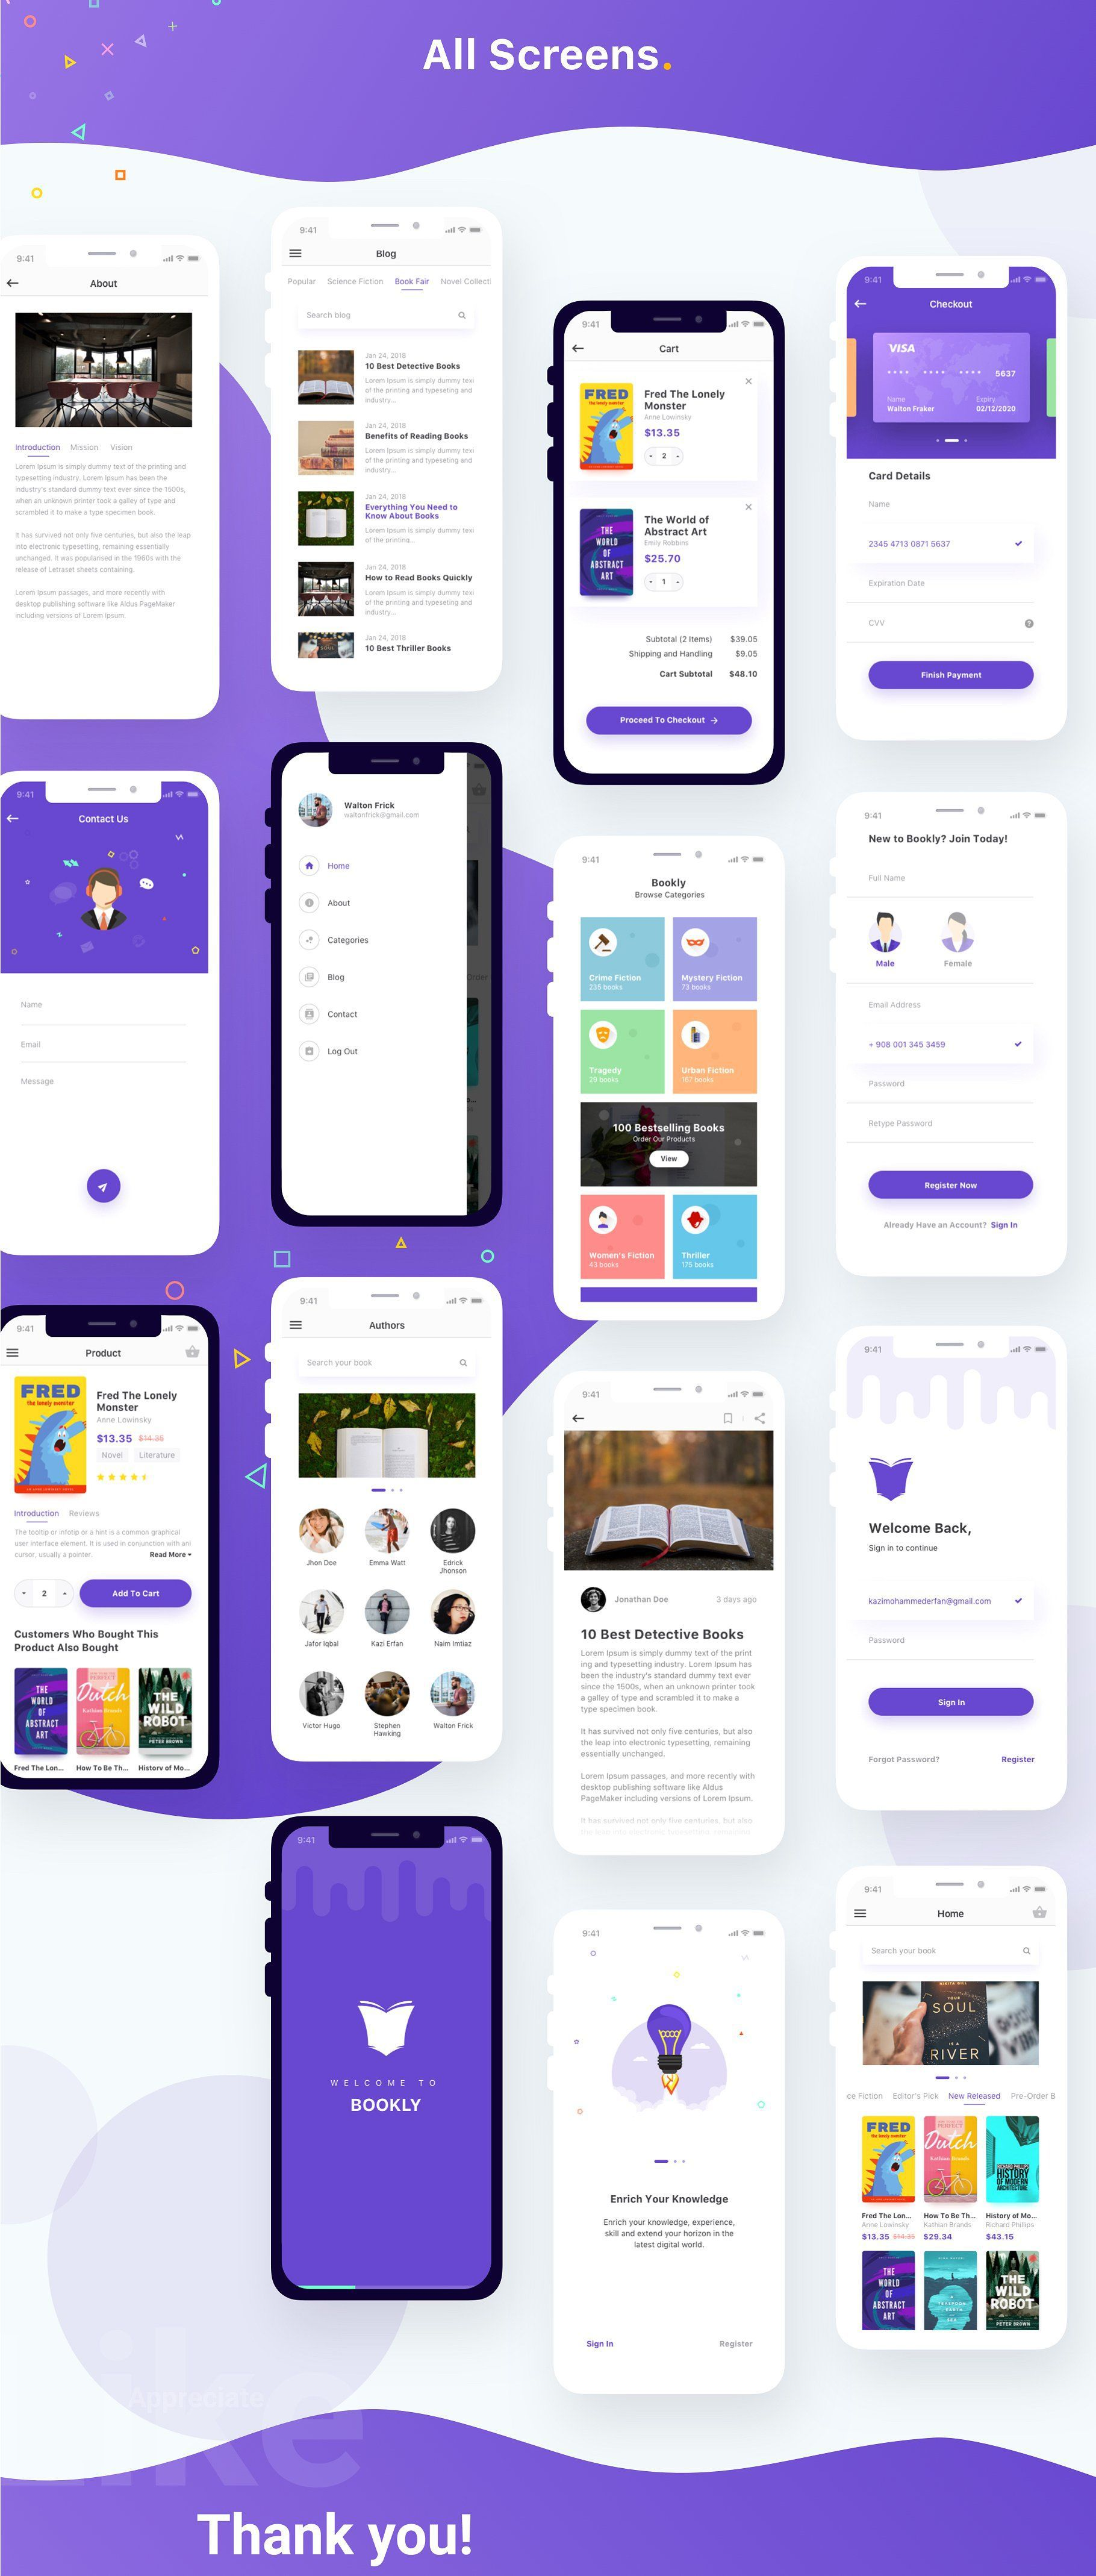 001 Fantastic Iphone App Design Template High Def  Templates Io Sketch Psd Free DownloadFull